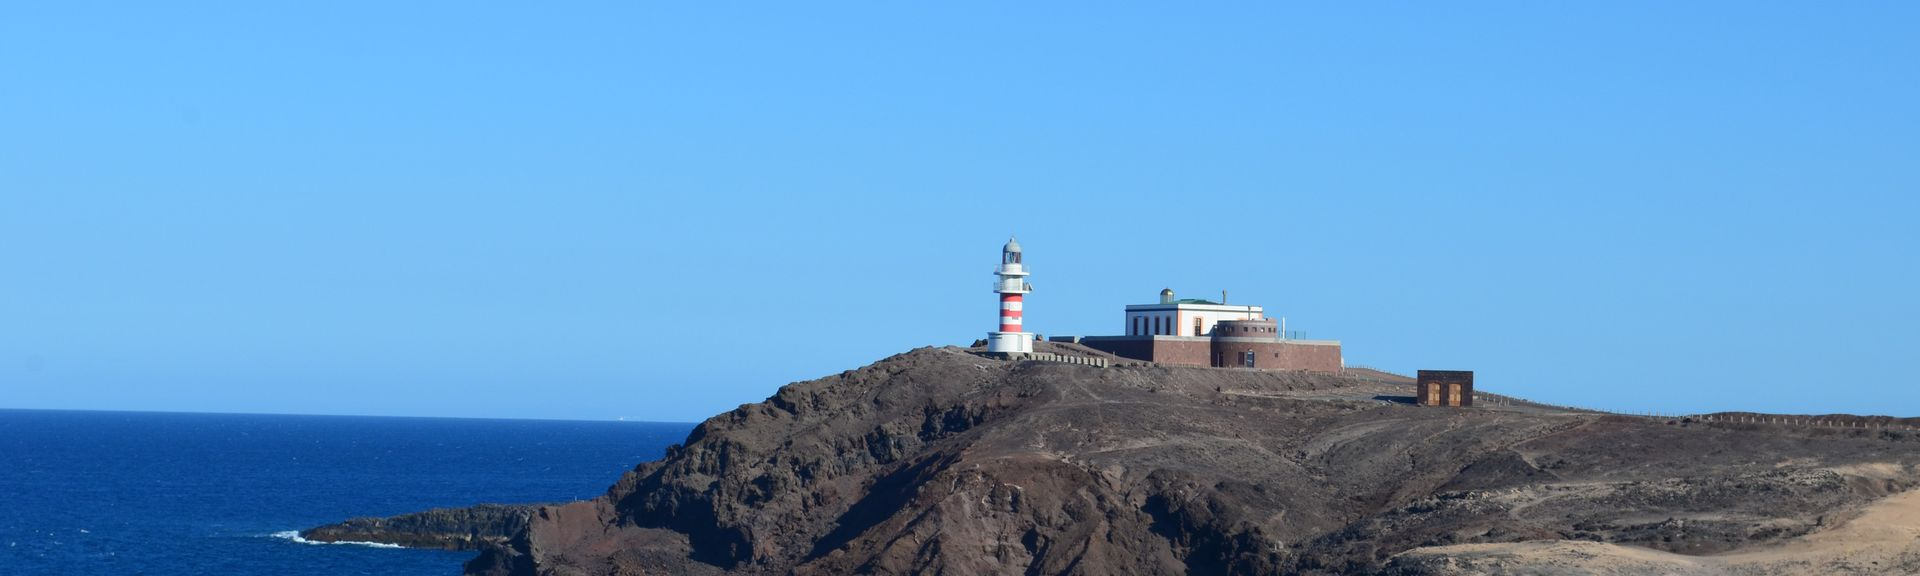 Tarajalillo, San Bartolome de Tirajana, Kanarieöarna, Spanien